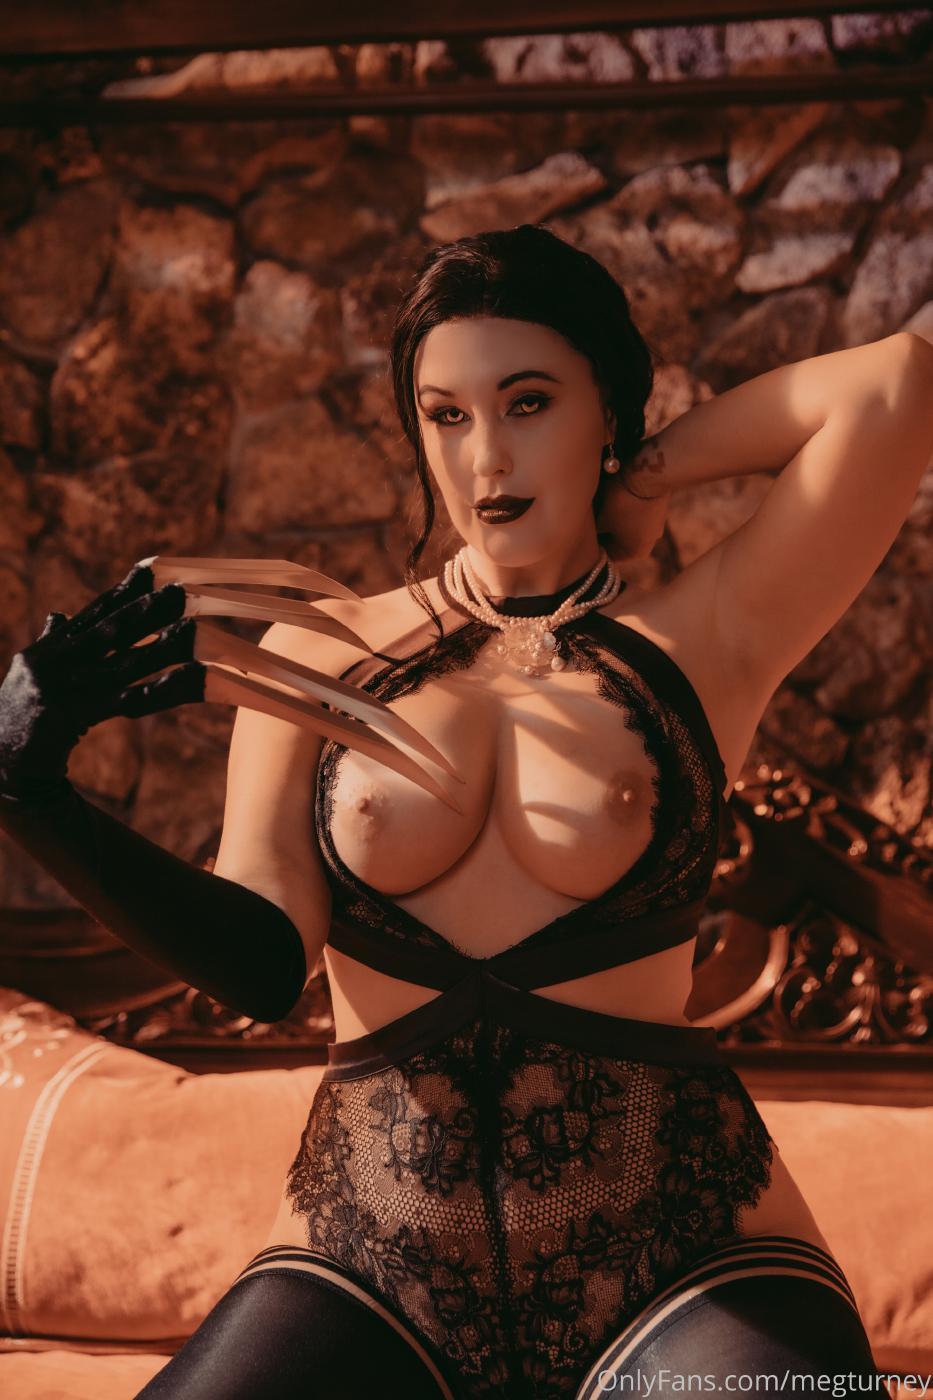 Meg Turney Lady Dimitrescu Cosplay Onlyfans Set Leaked 0032